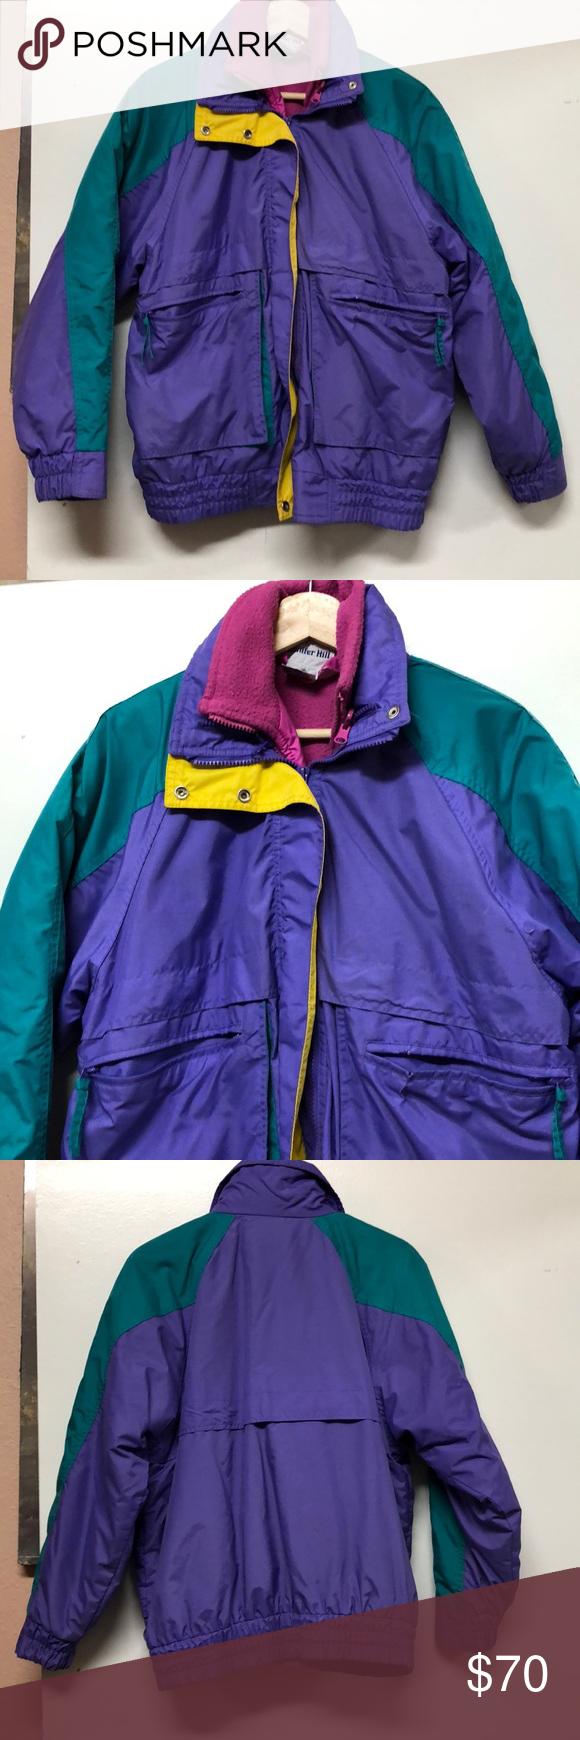 Vintage colorful windbreaker fleece jacket my posh picks